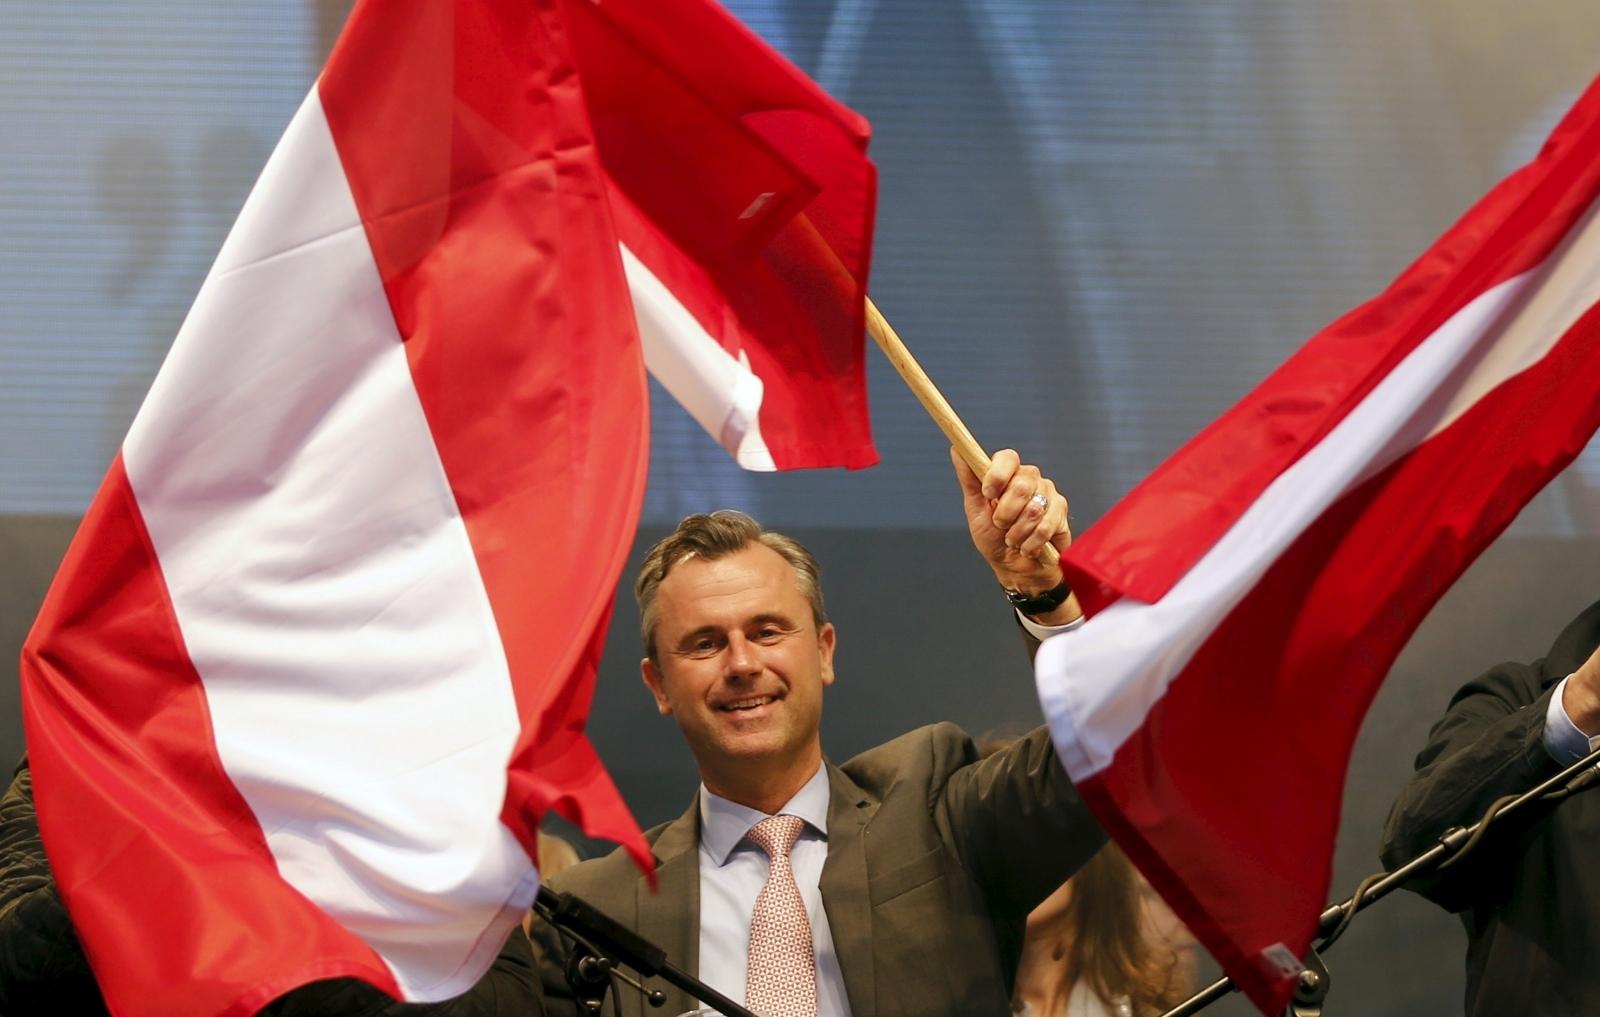 Austrian Freedom Party